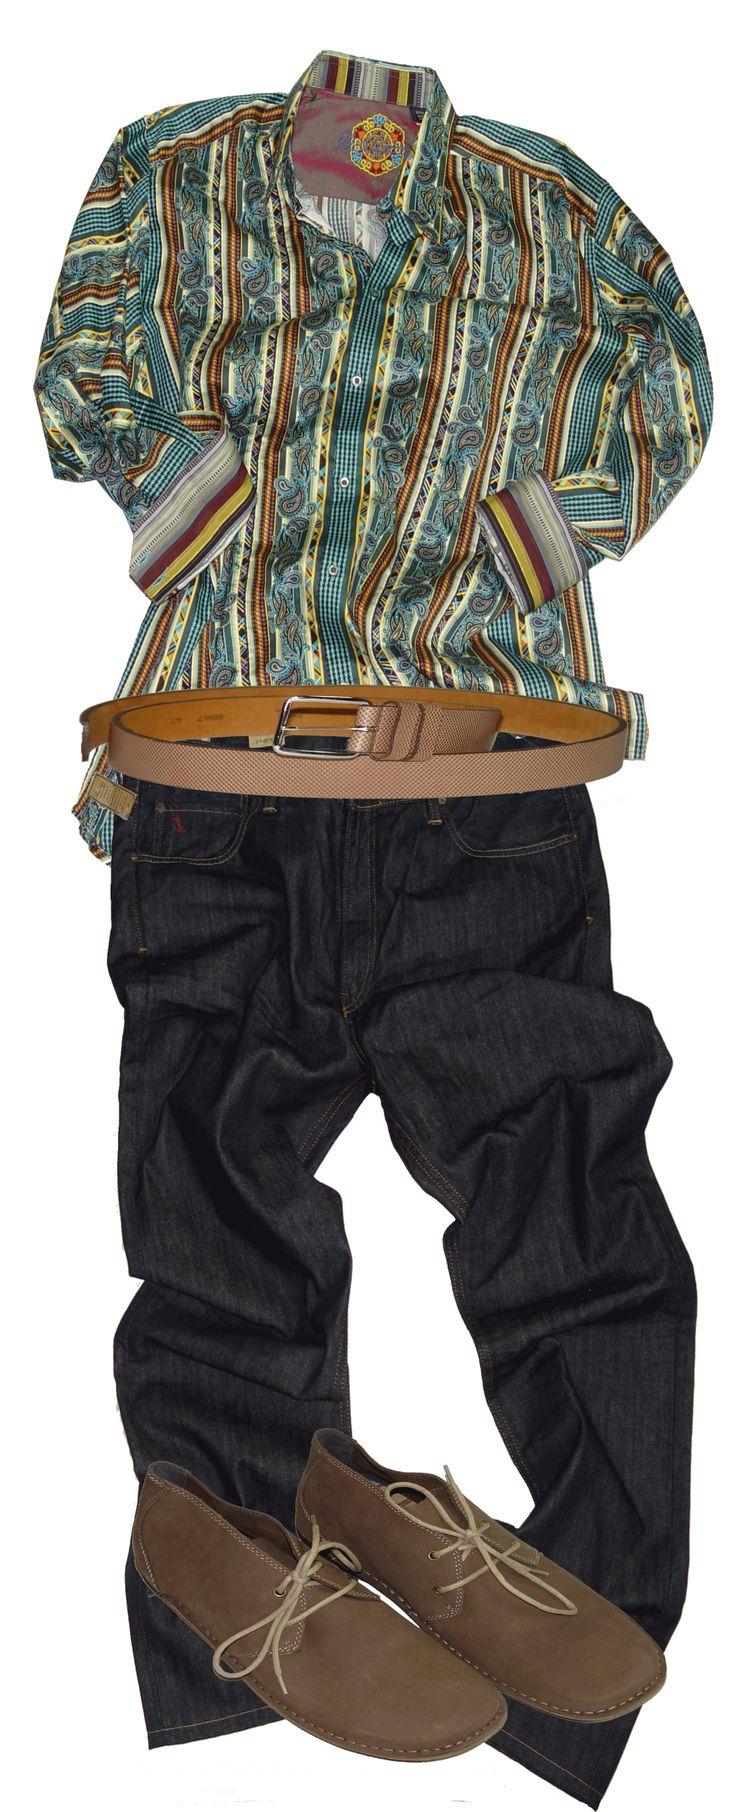 Casual fridays robert graham shirt bigandtall 39 cause for Robert graham tall shirts